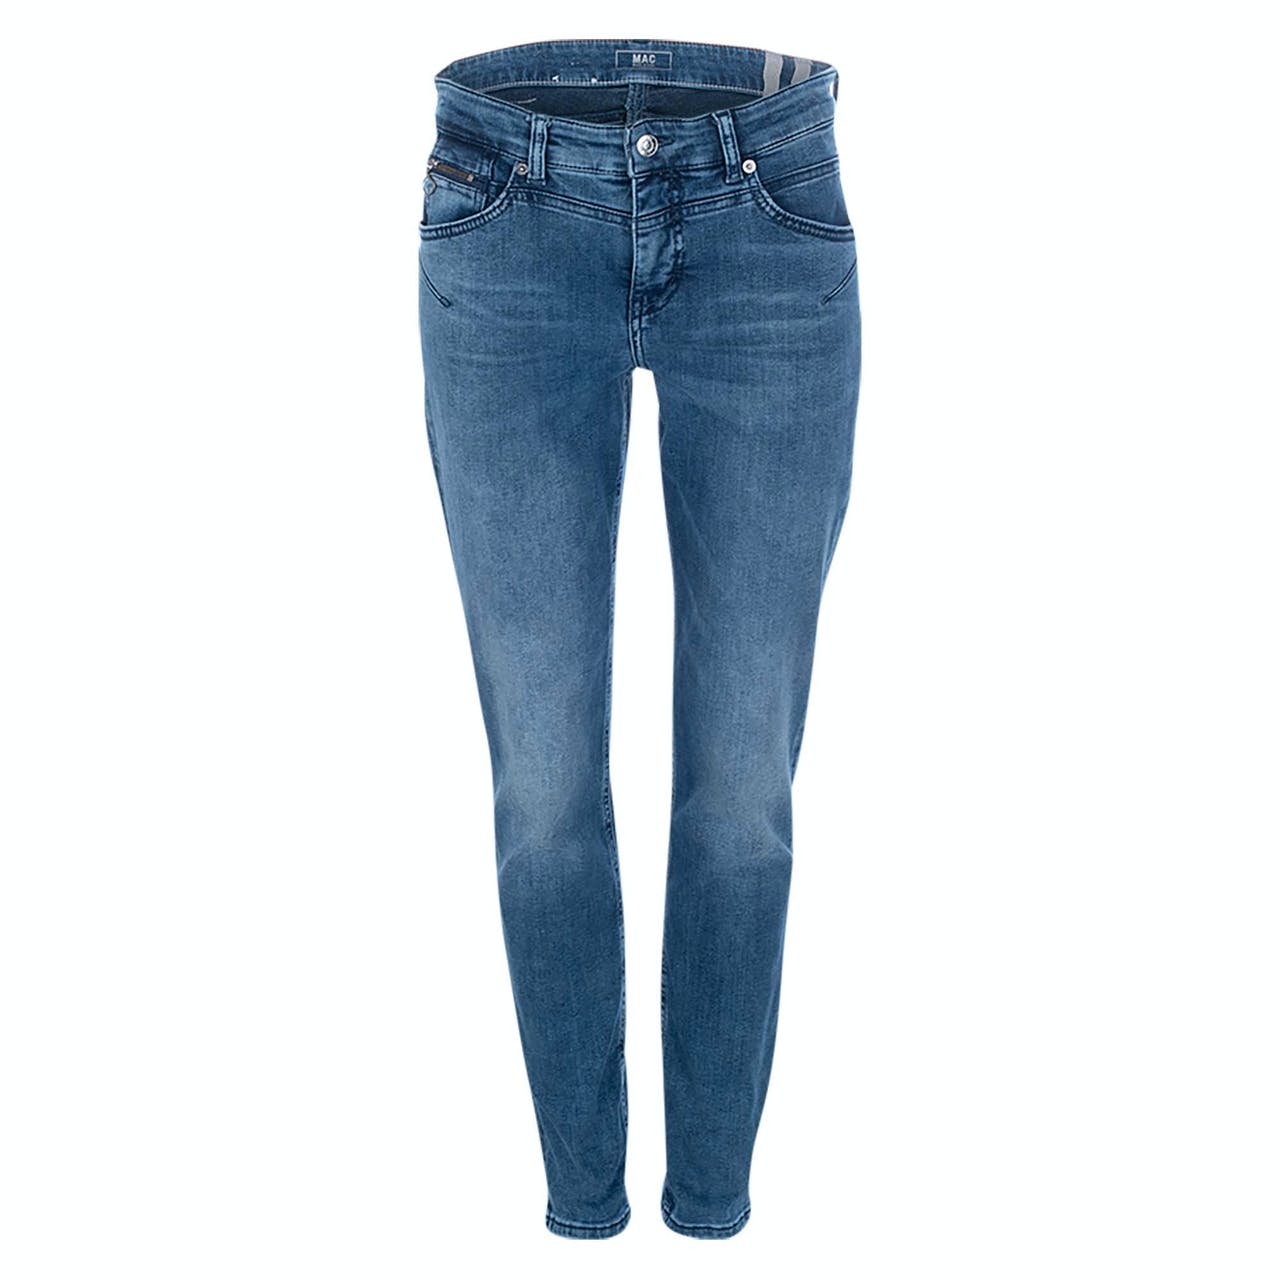 Jeans - Slim Leg